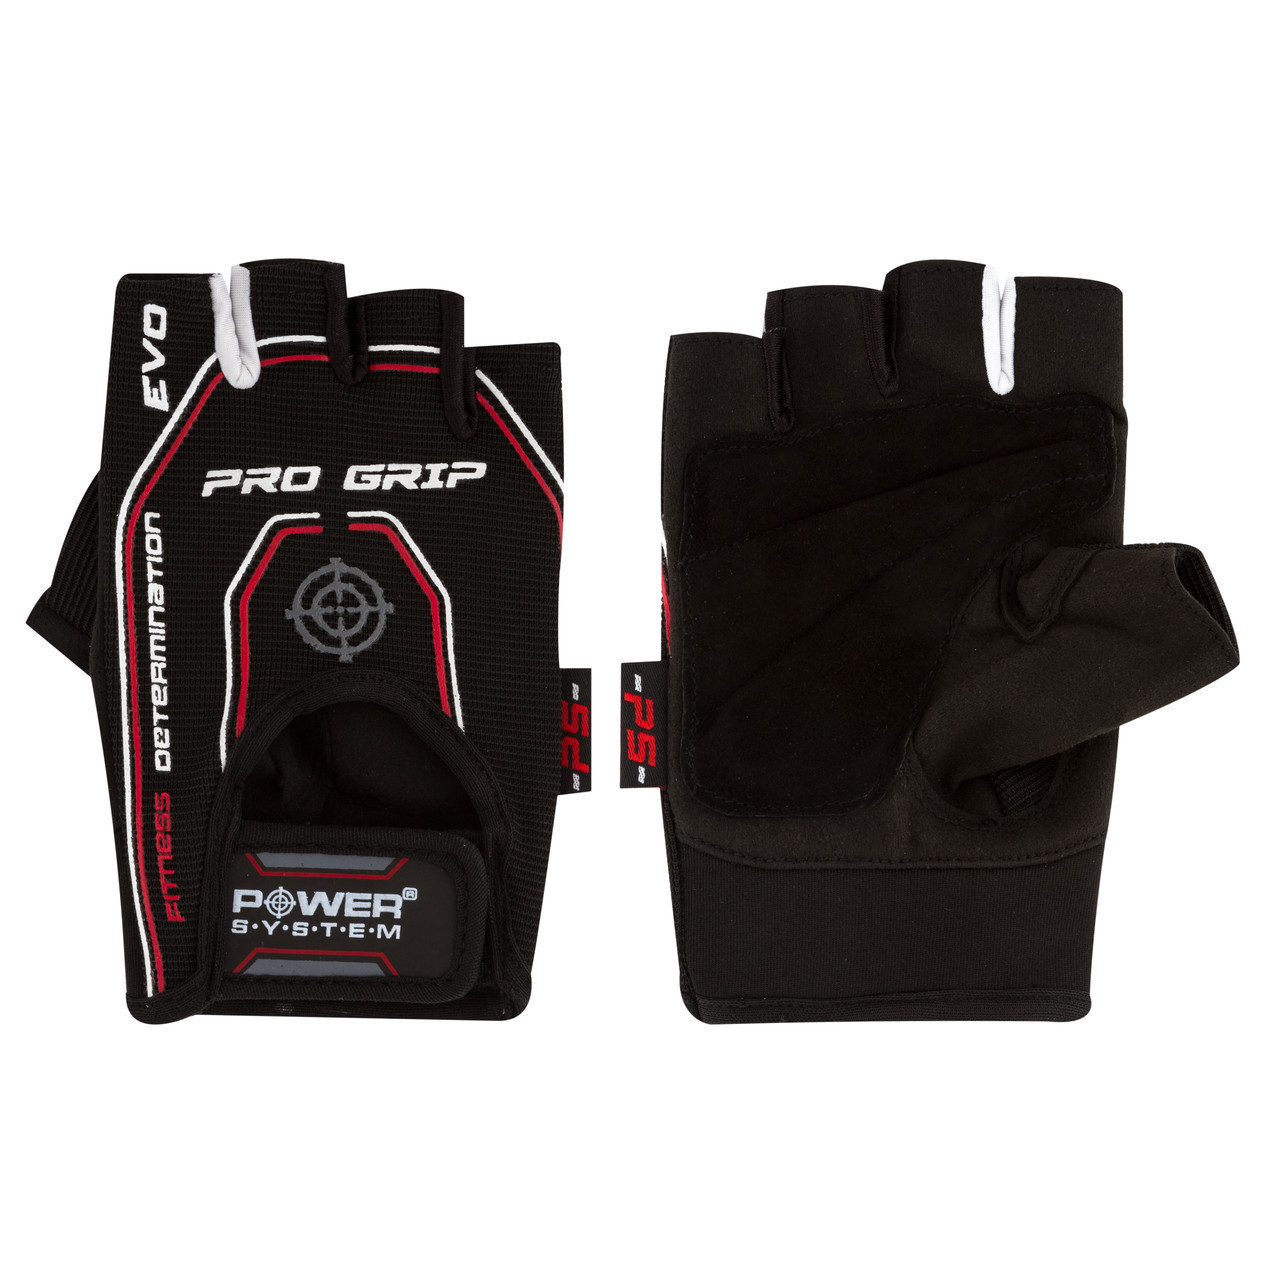 Перчатки для фитнеса и тяжелой атлетики Power System Pro Grip EVO PS-2250E Black XL